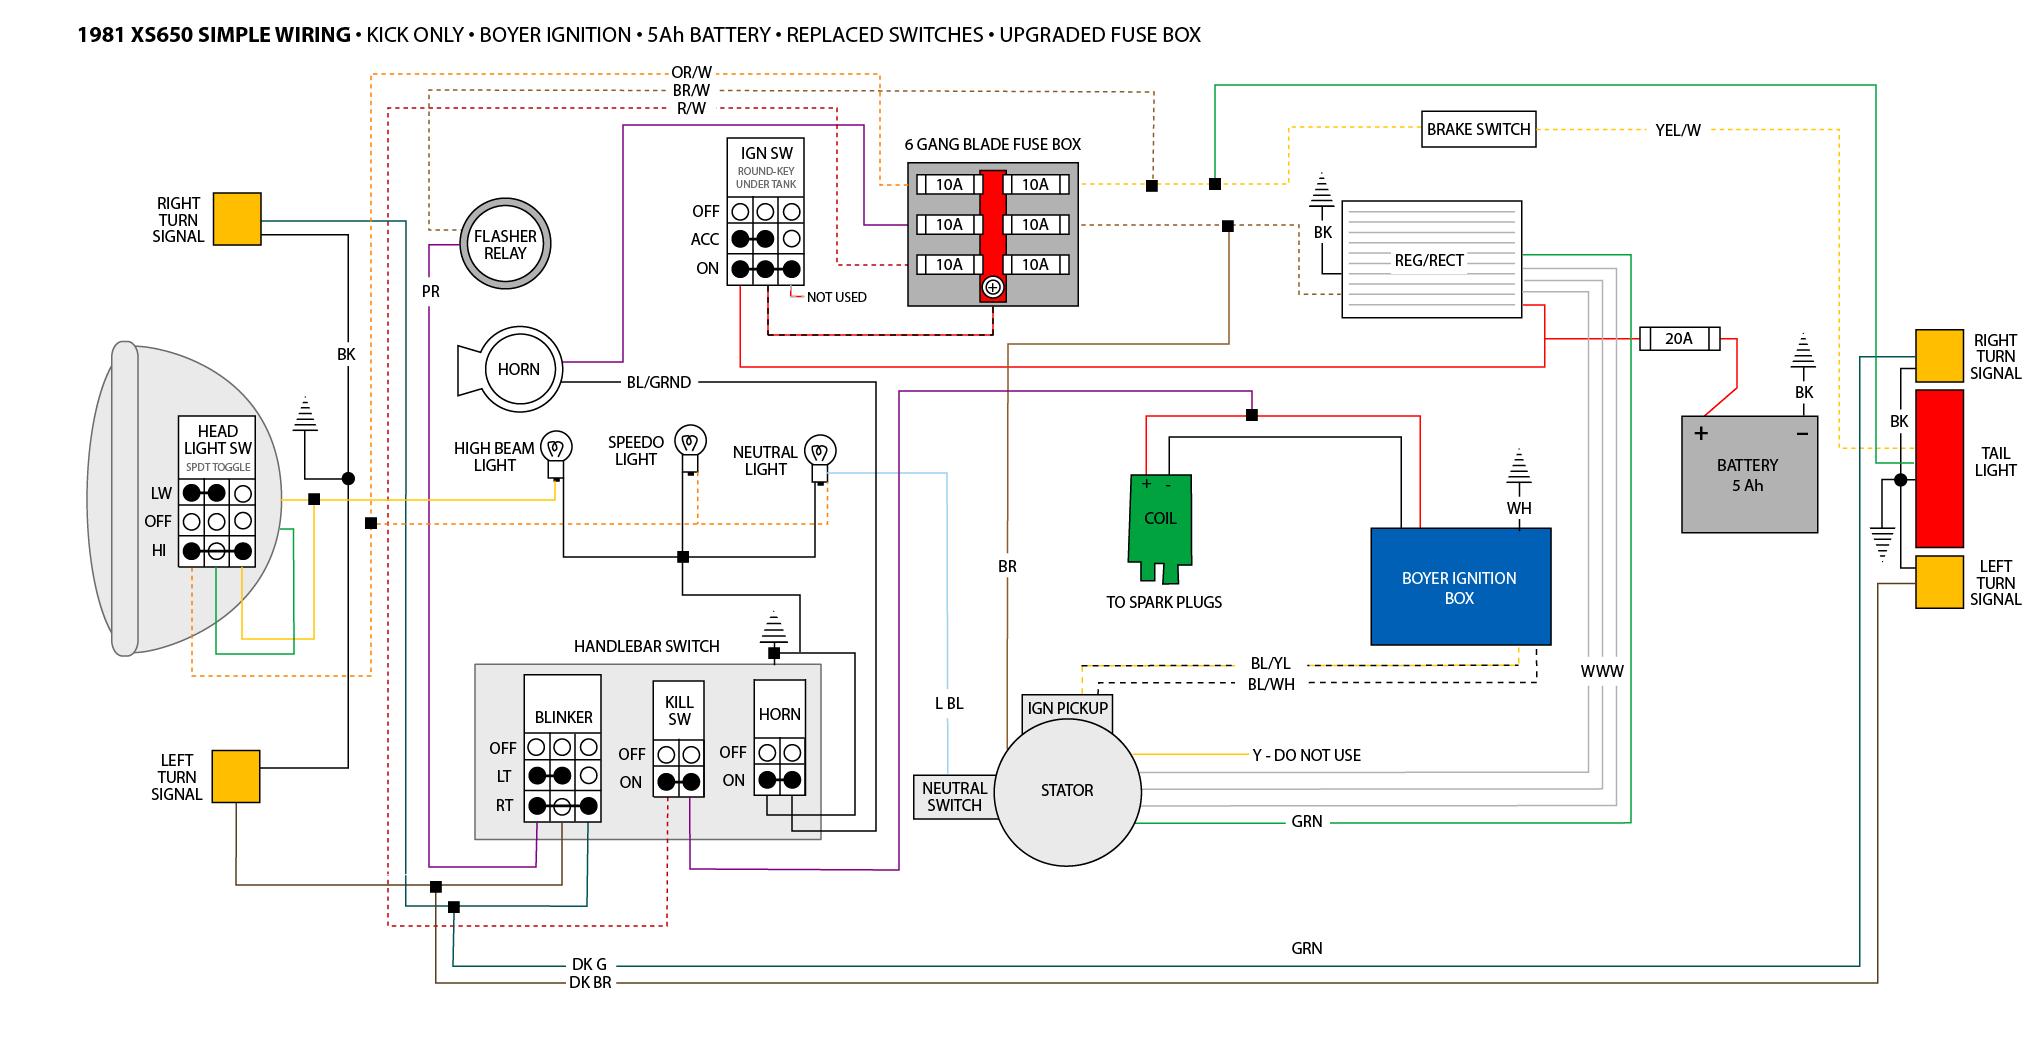 Wiring diagram xs400 free download wiring diagram xwiaw xs650 free download wiring diagram need my new wiring diagram reviewed yamaha xs650 forum of wiring asfbconference2016 Images